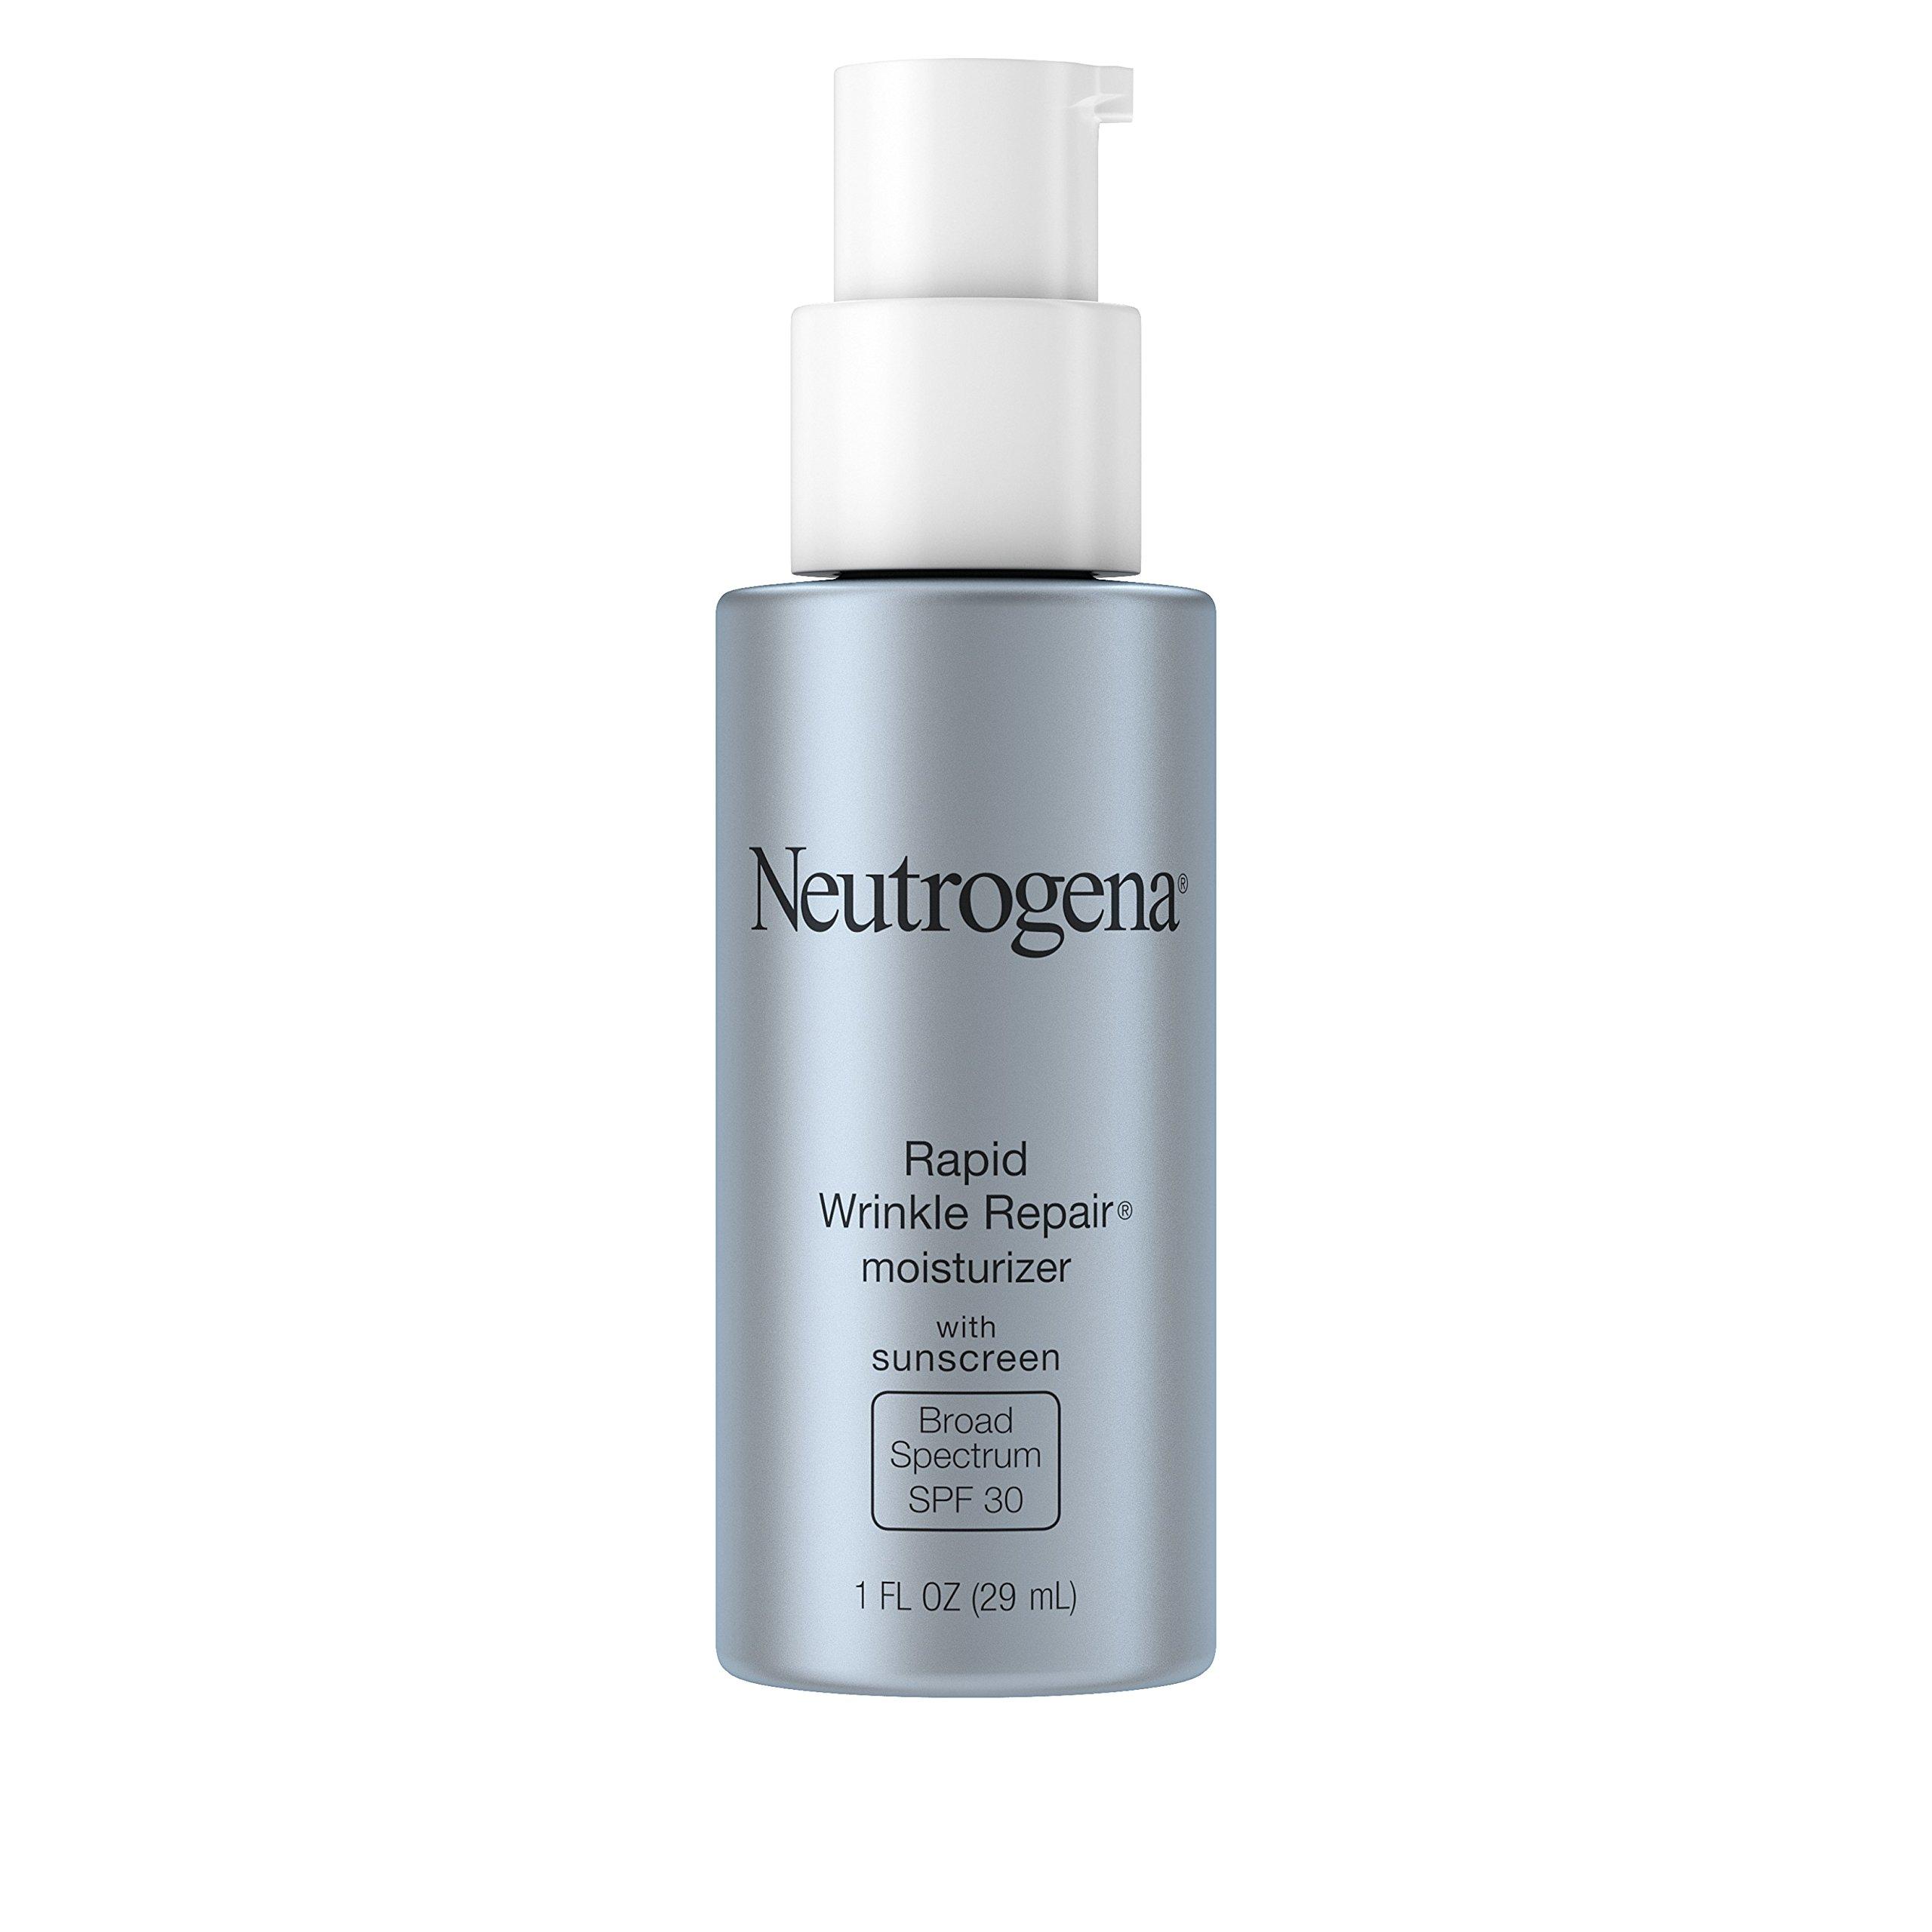 Neutrogena Rapid Wrinkle Repair Anti-Wrinkle Retinol Daily Face Moisturizer, with SPF 30 Sunscreen, 1 fl. Oz